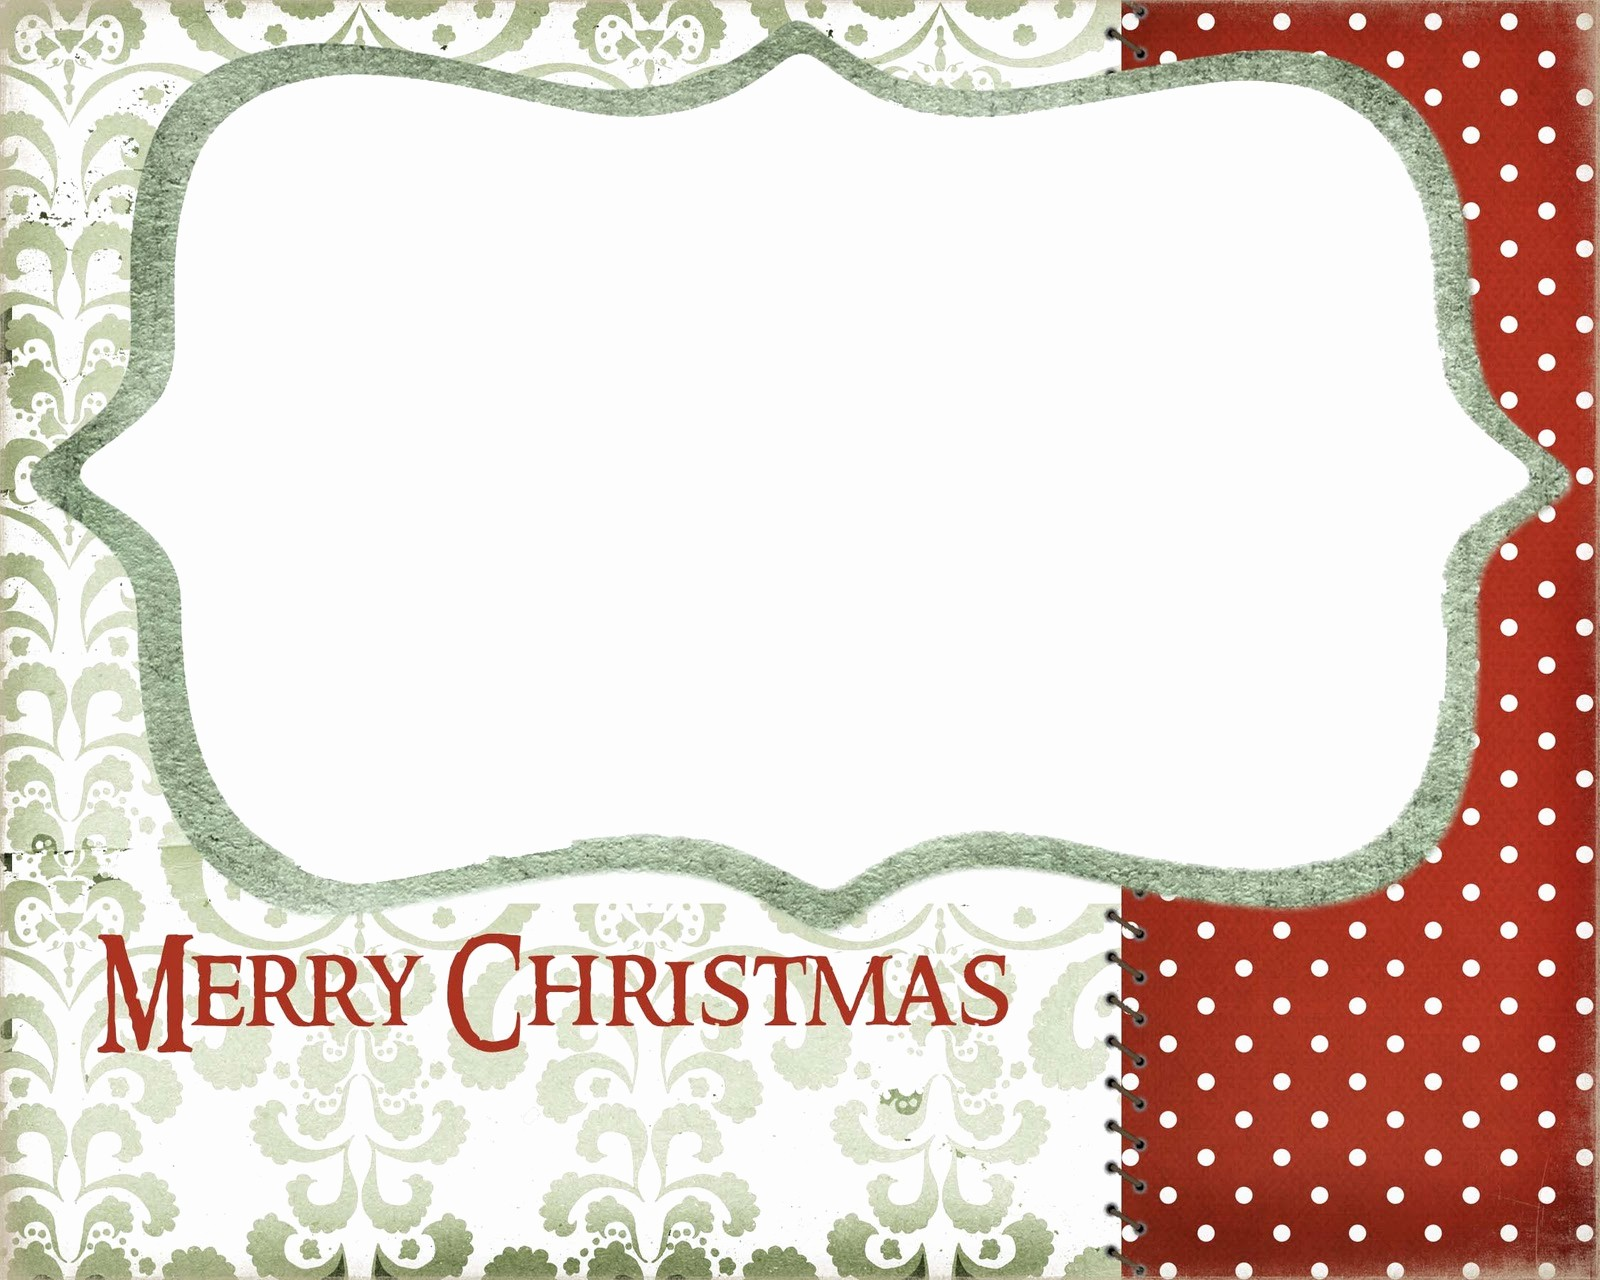 Greeting Cards Templates Free Downloads Inspirational Christmas Card Display 5 Printable Christmas Cards